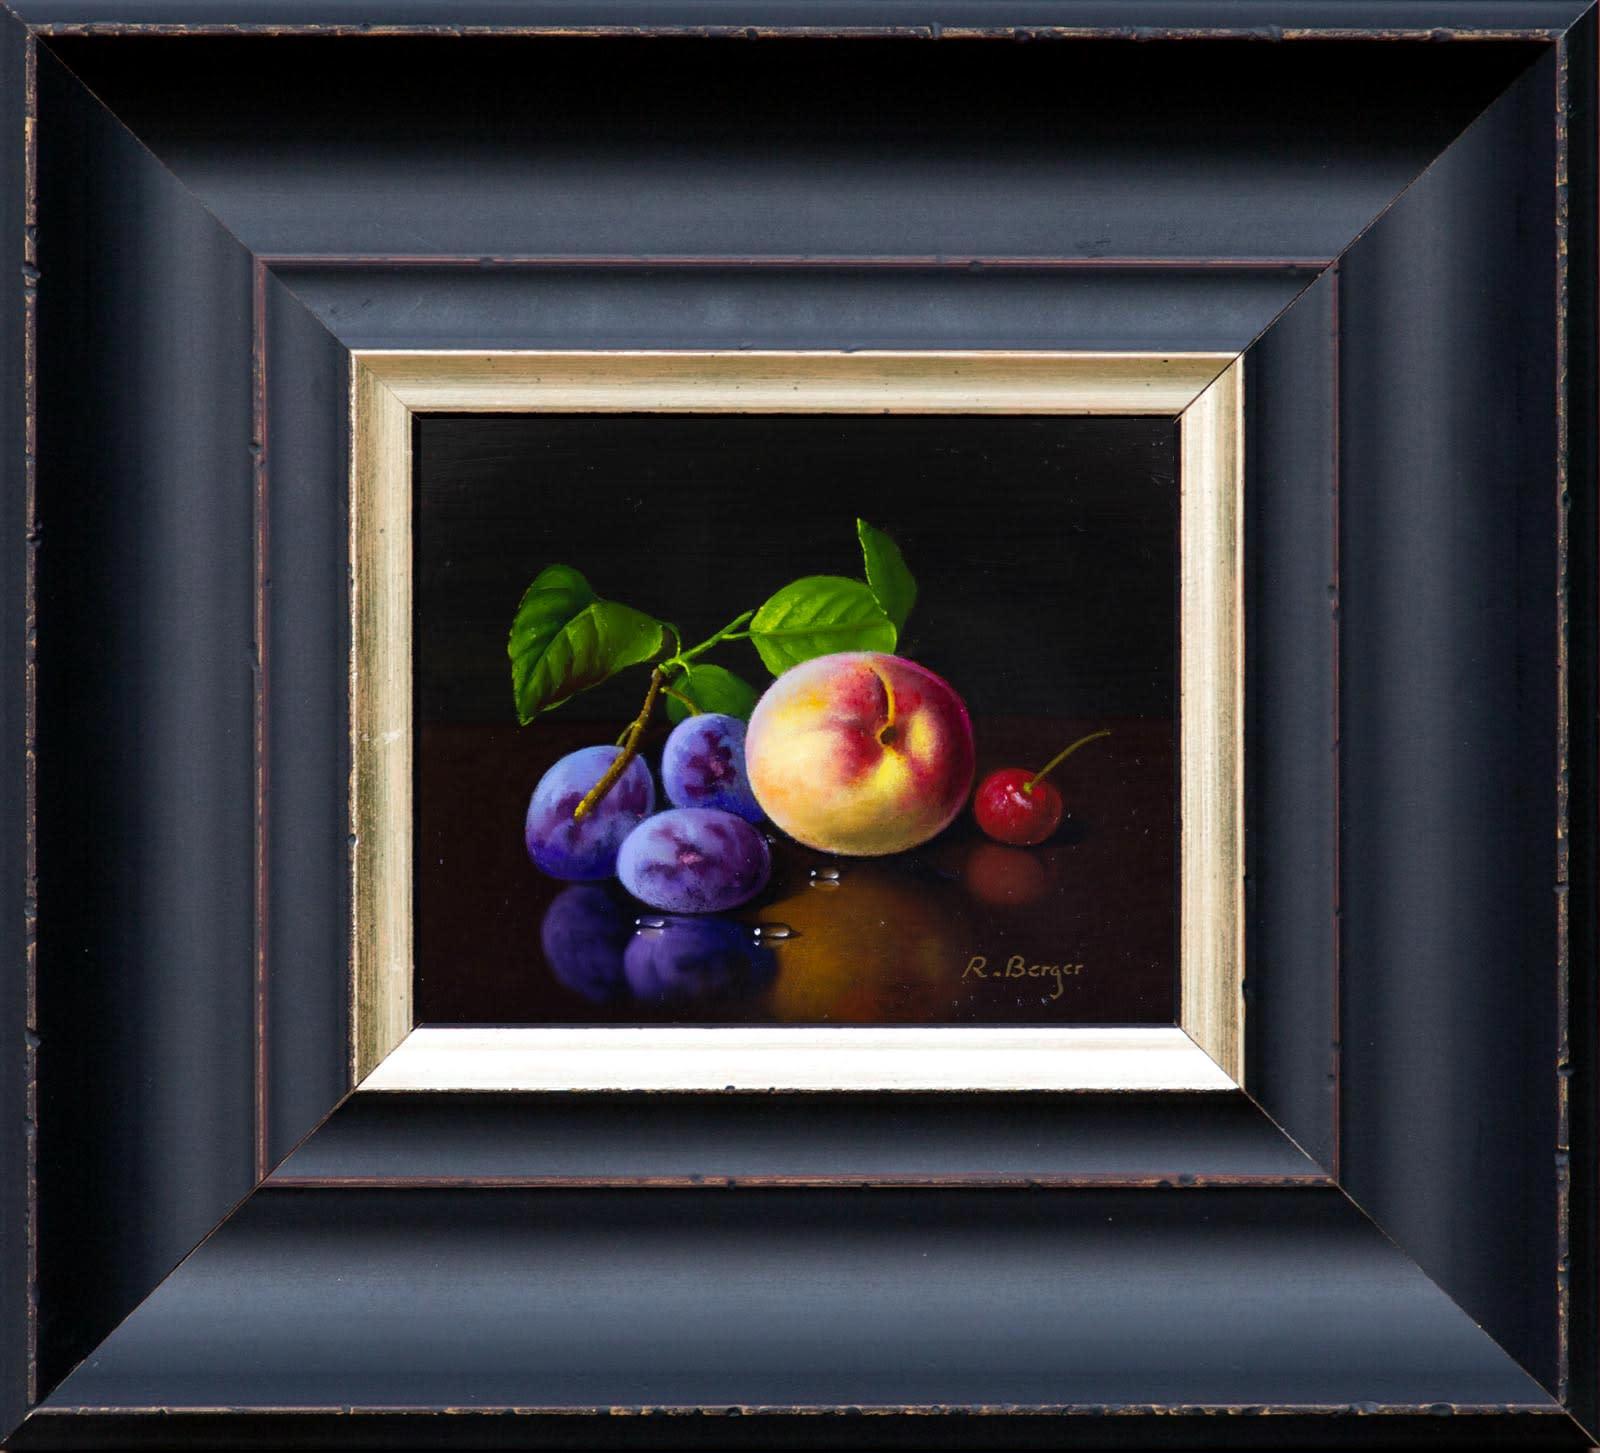 Plum, Peach & Cherry, Ronald Berger